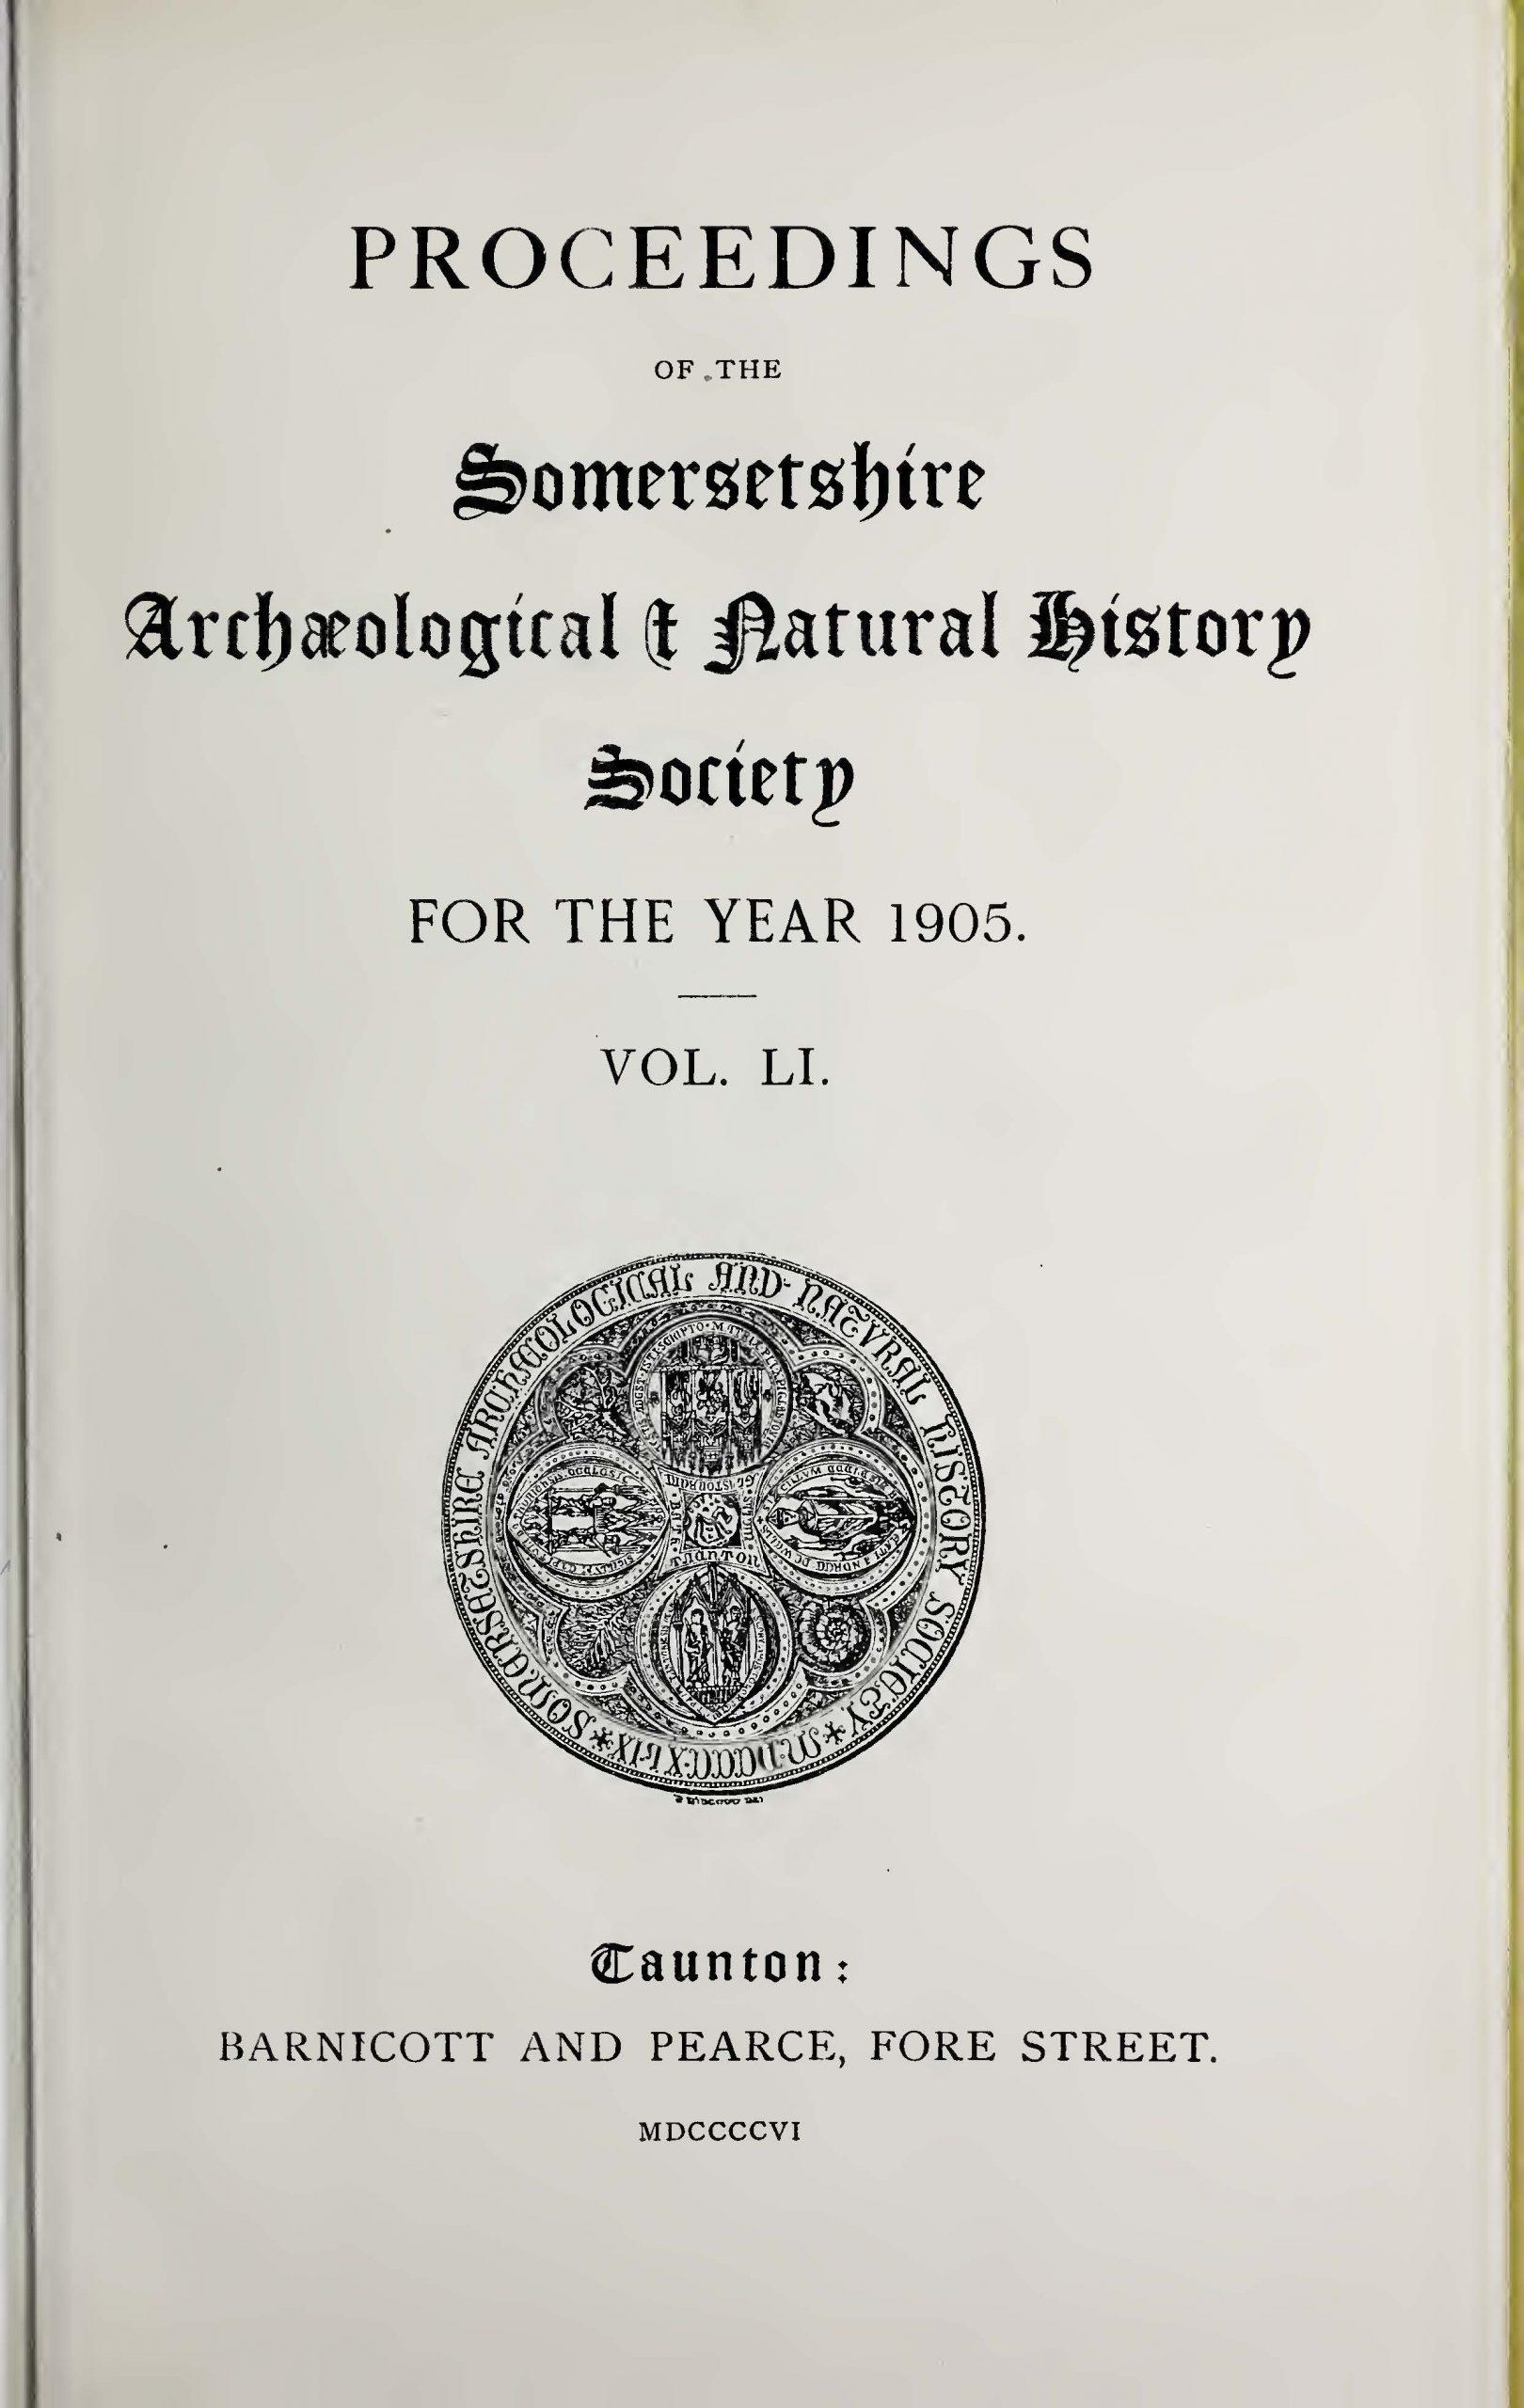 SANHS Proceedings Volume 51 cover